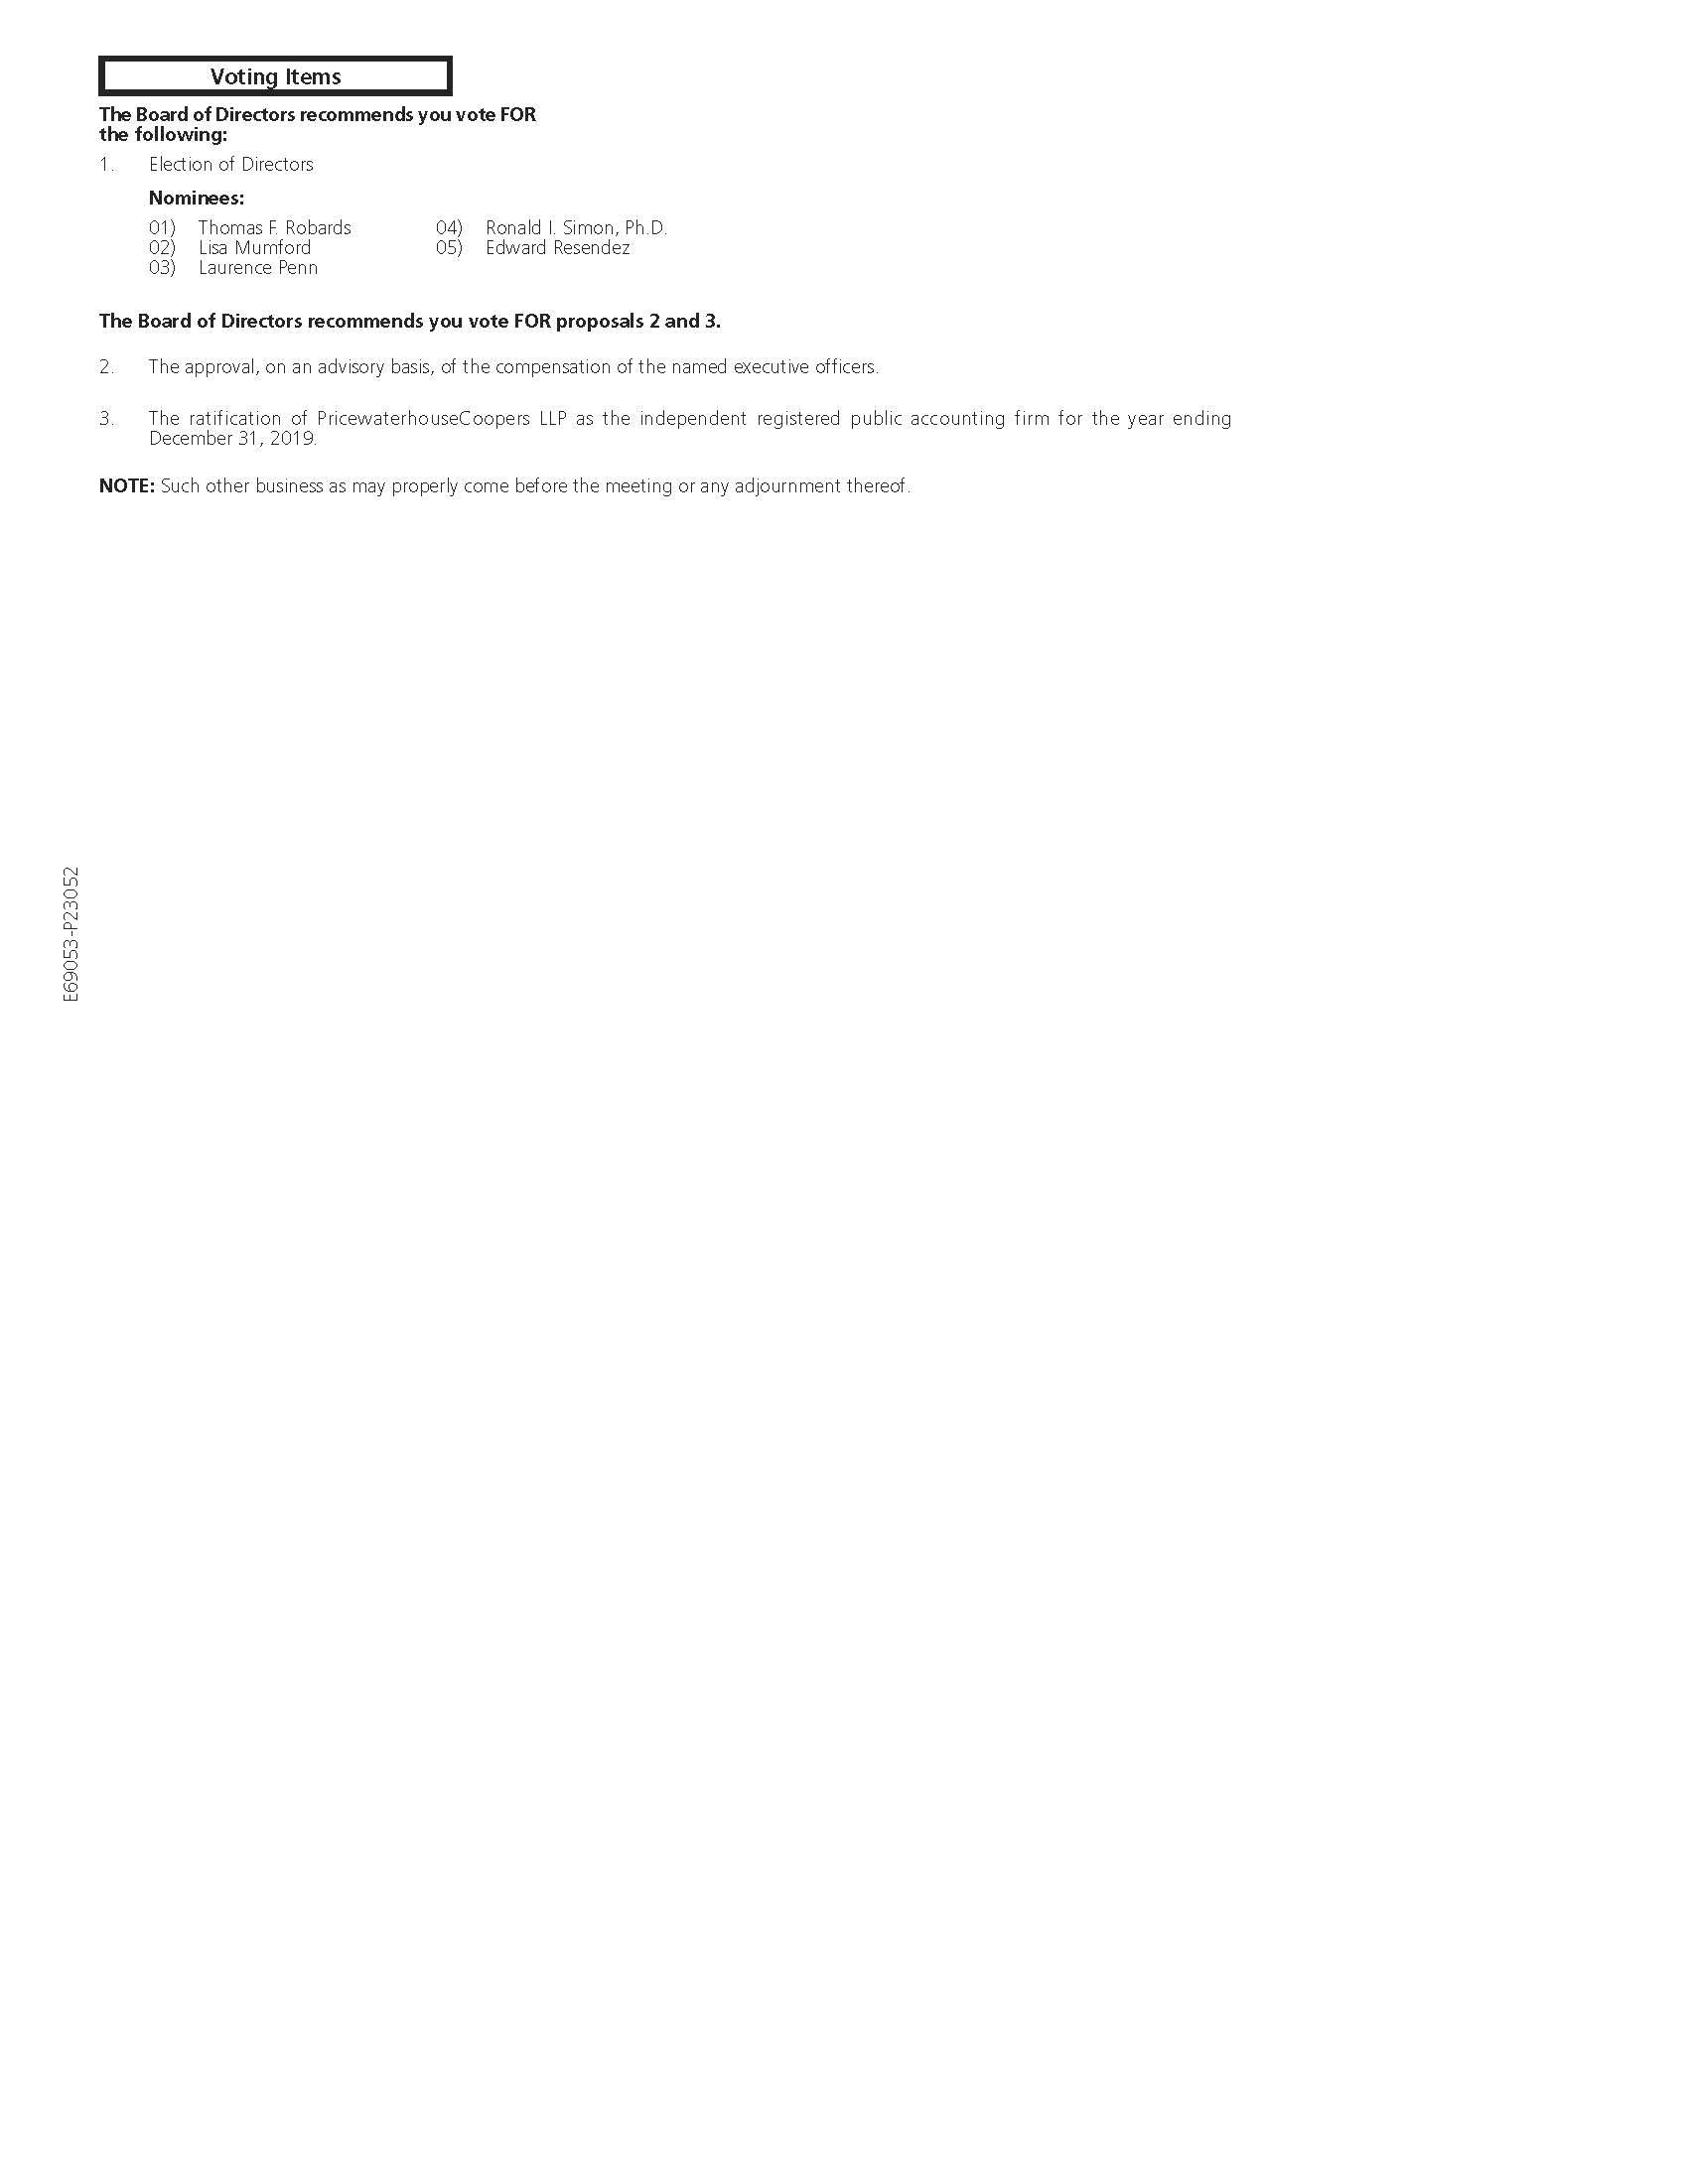 https://cdn.kscope.io/fd6134a13bc7968a2f5f9cef20578023-efcnoticepage3.jpg